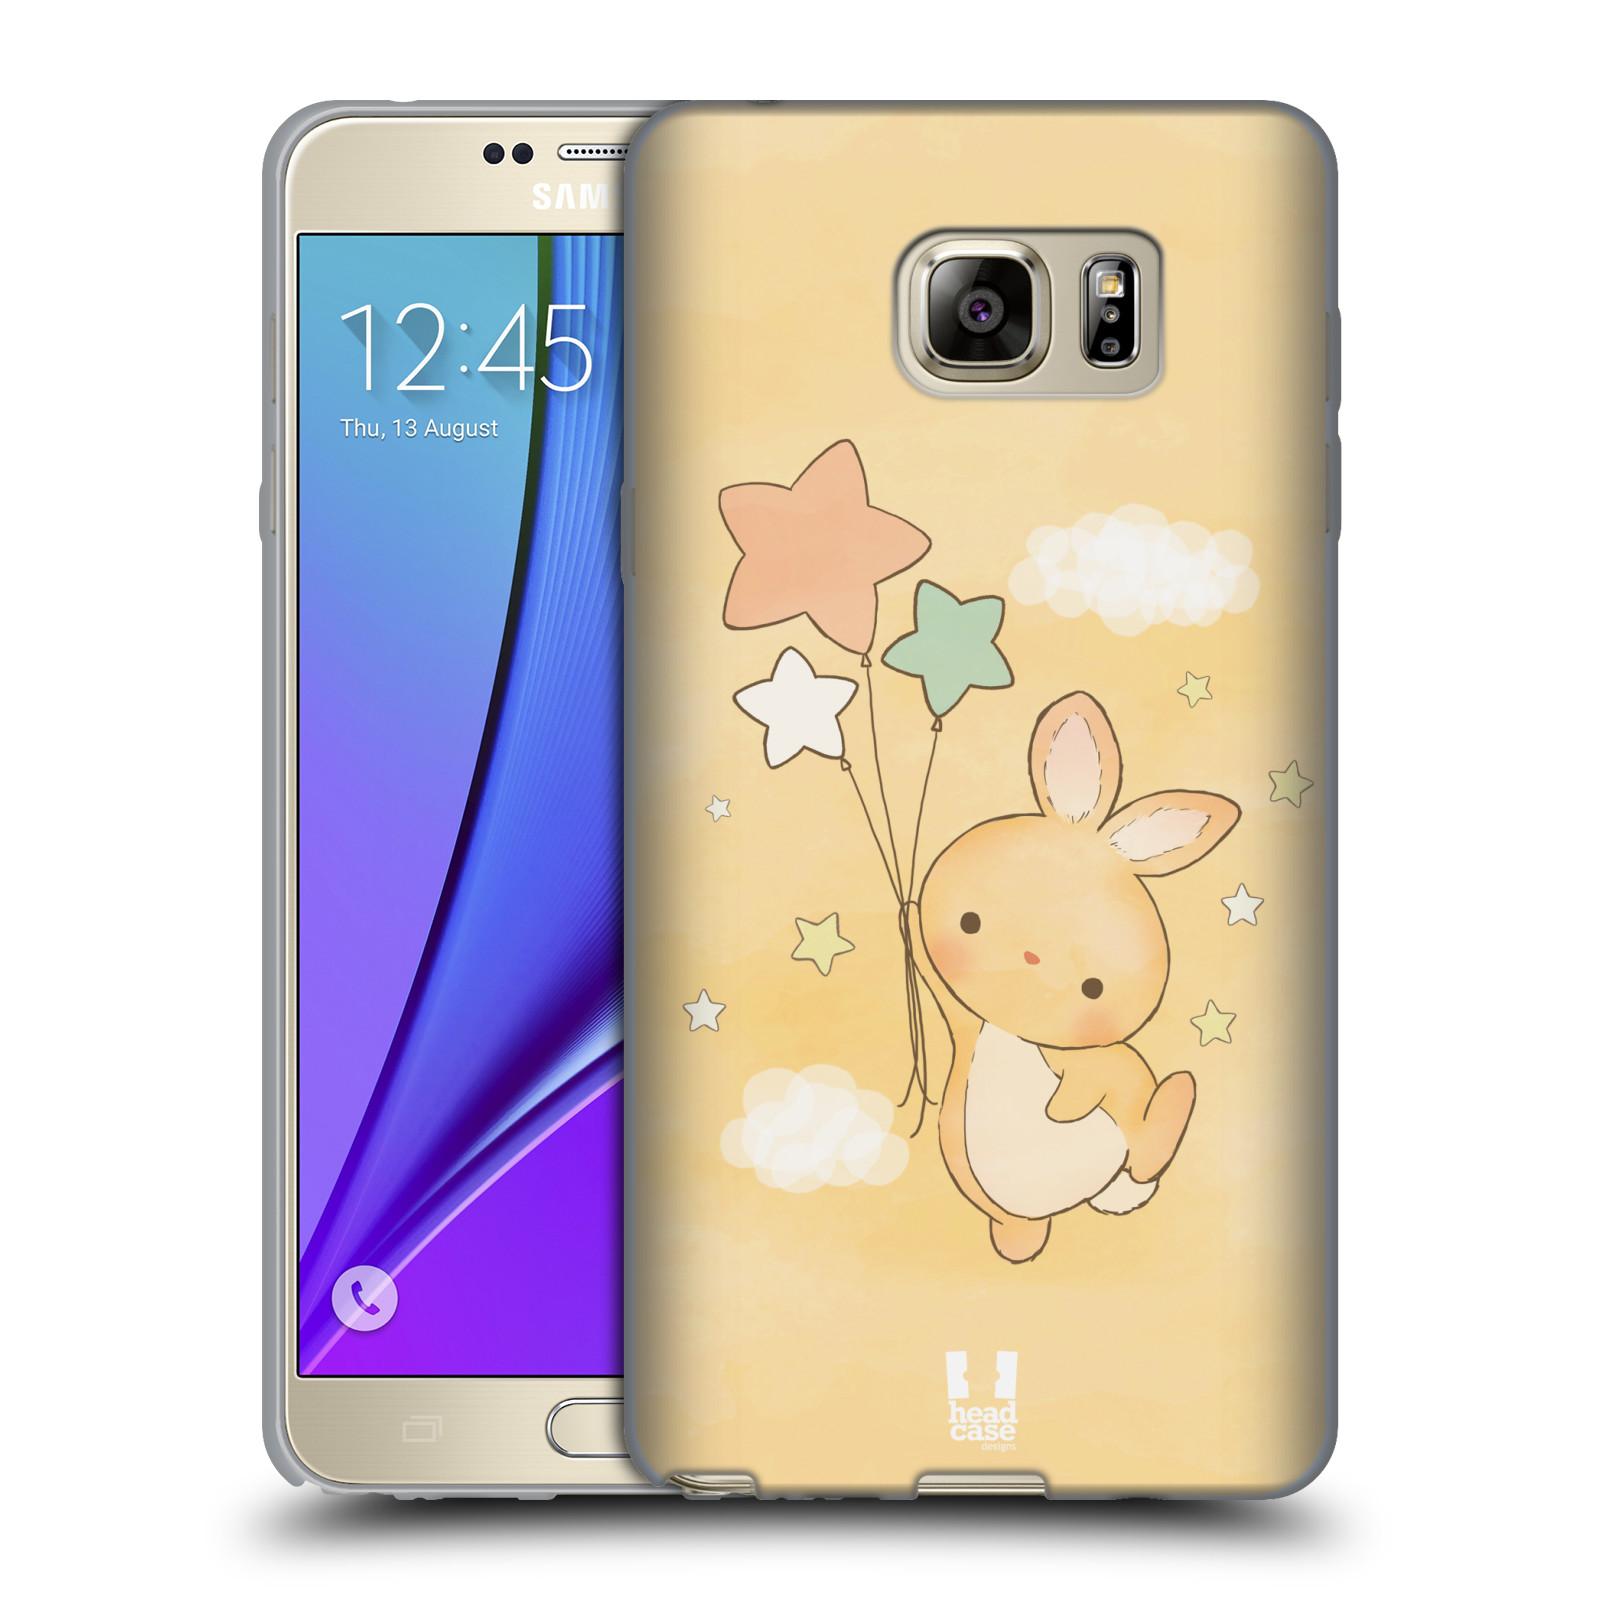 HEAD CASE silikonový obal na mobil Samsung Galaxy Note 5 (N920) vzor králíček a hvězdy žlutá